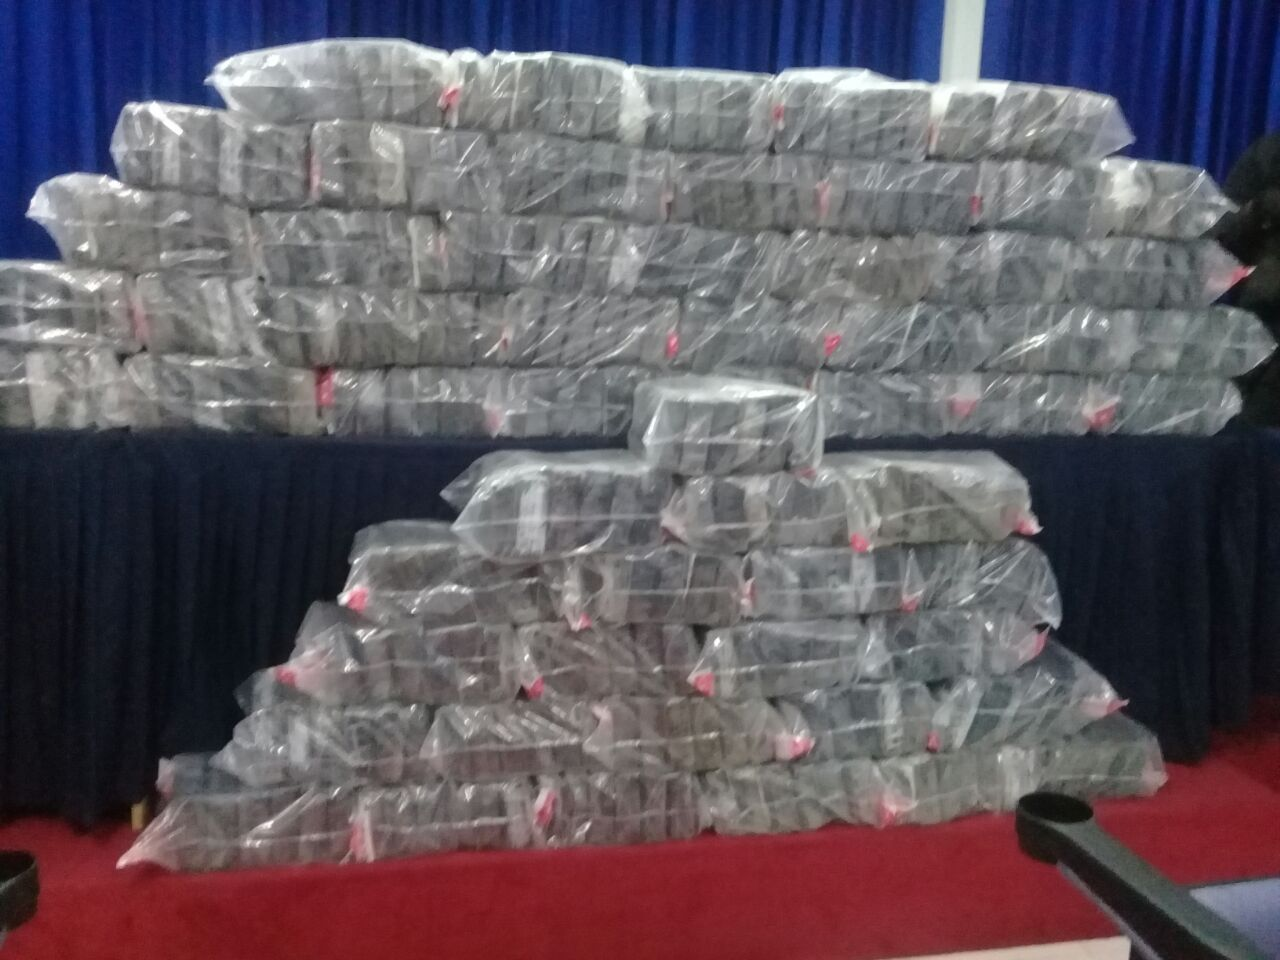 DNCD decomisa 345 paquetes de droga próximo a la autopista Duarte